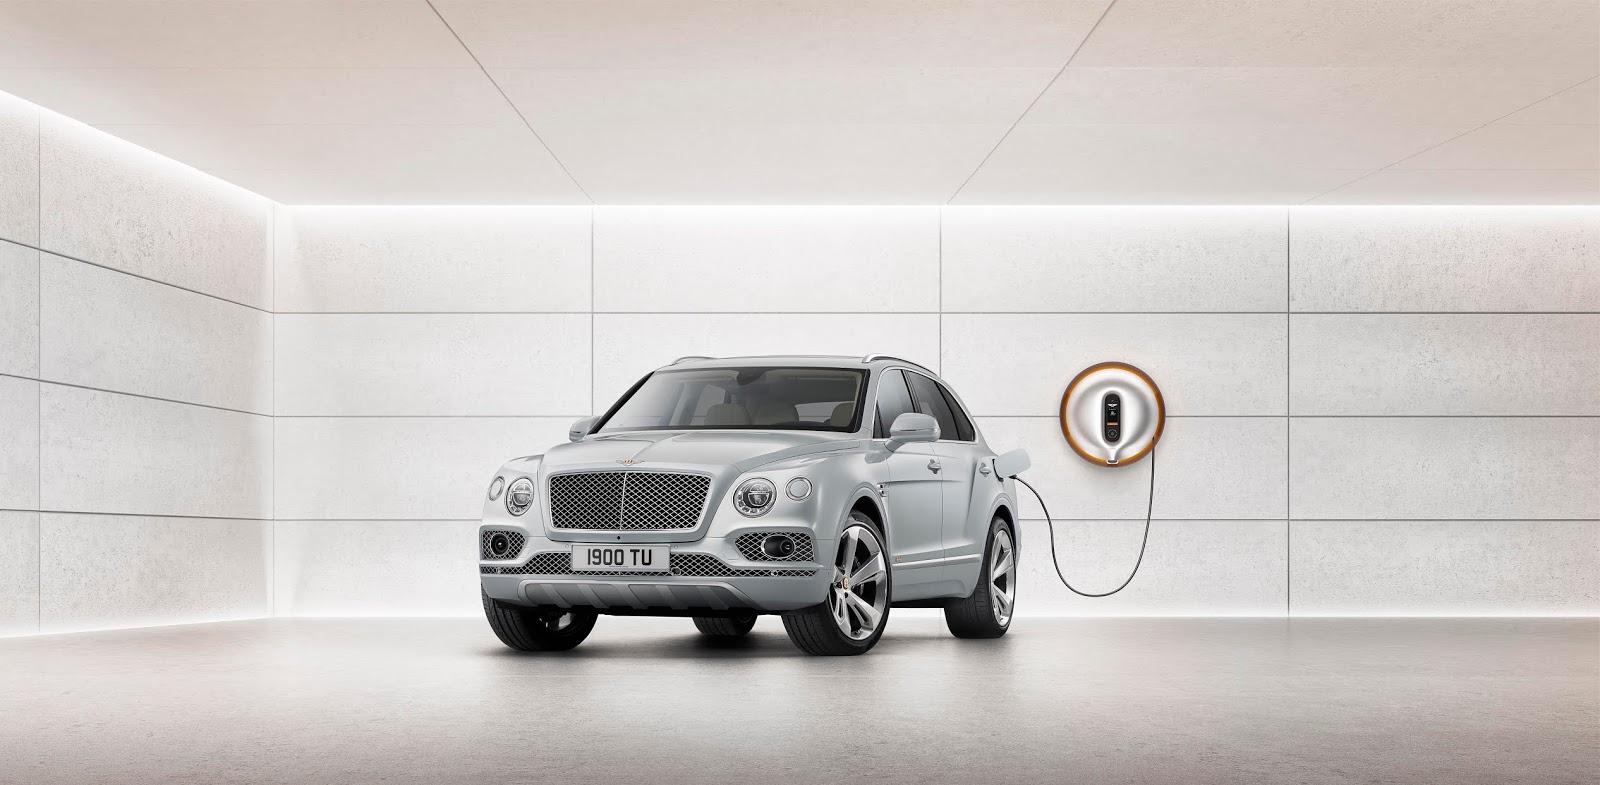 Bentley2BBentayga2BHybrid2Bx2BStarck2B 2B01 Η Bentayga Hybrid, ανοίγει ένα νέο κεφάλαιο στην ιστορία της αυτοκίνησης